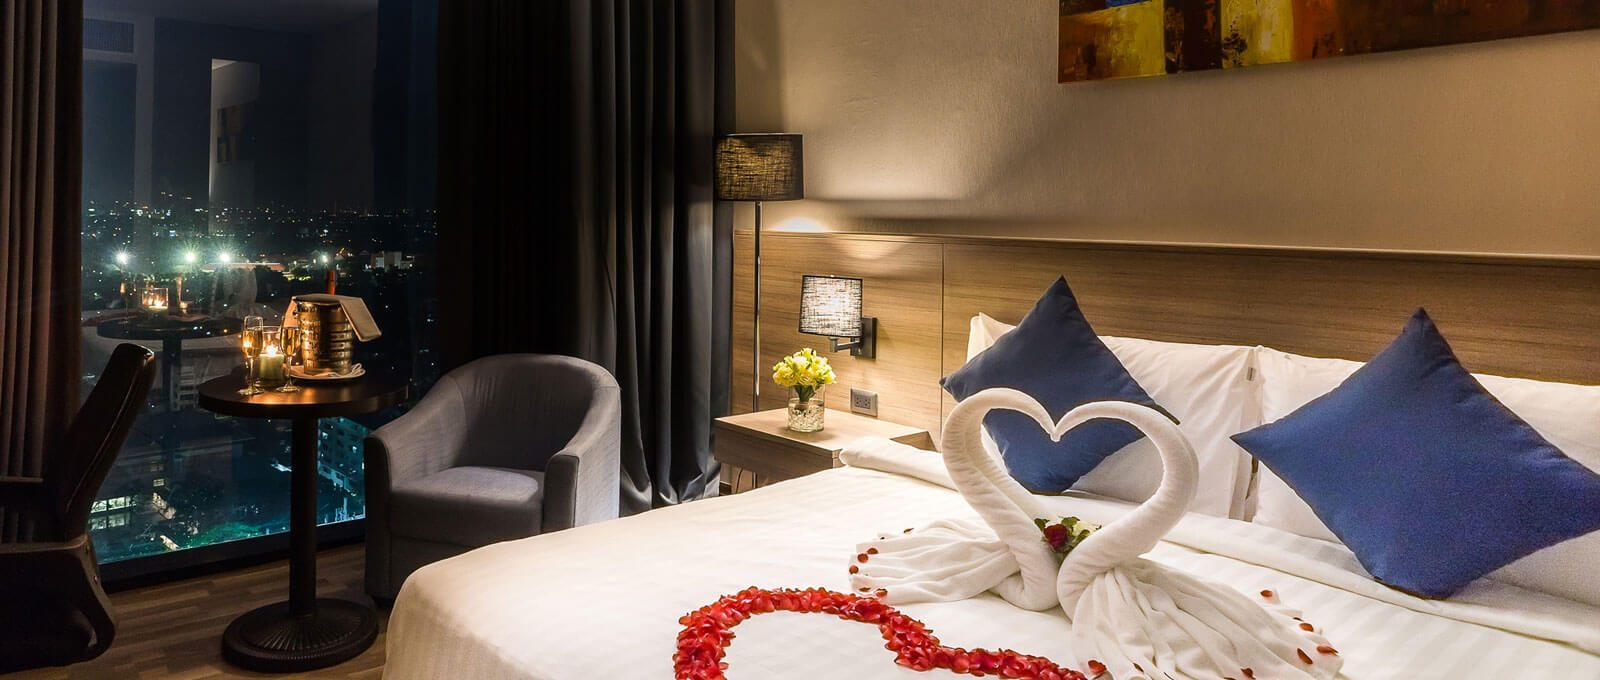 Best Western Plus Wanda Grand Hotel